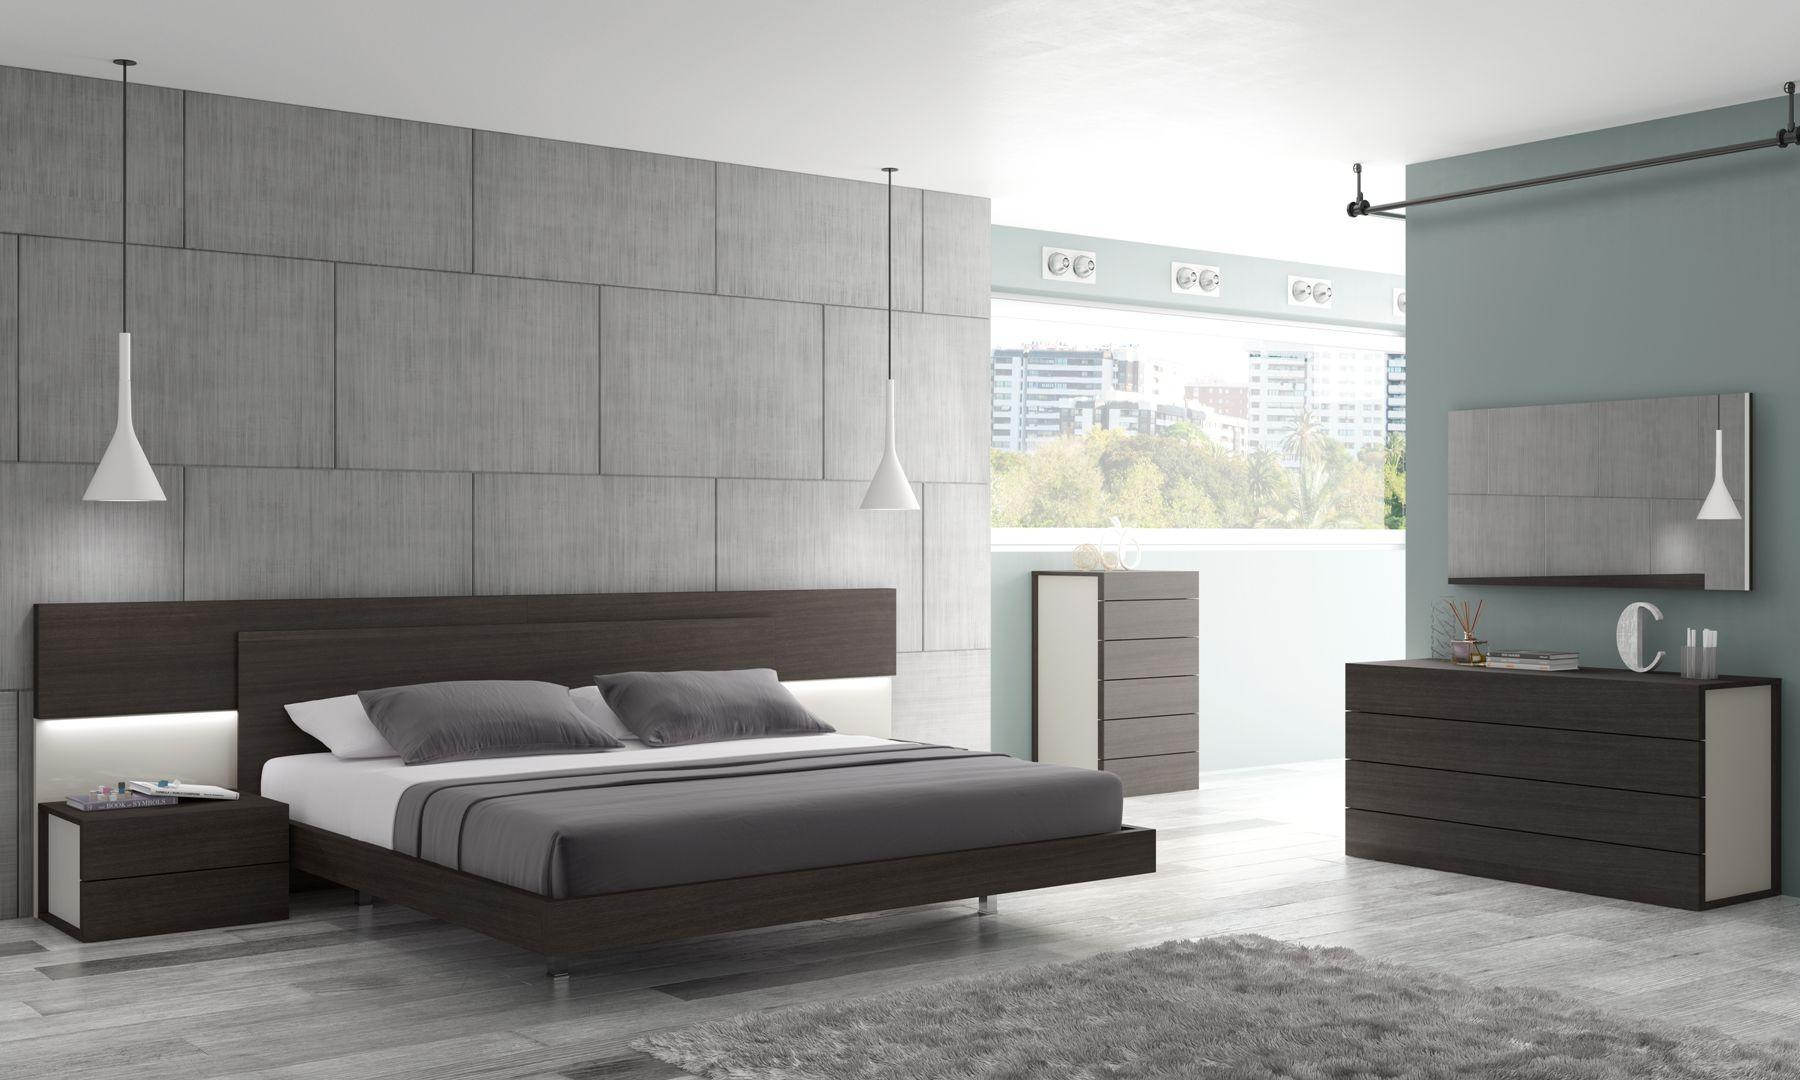 Maia Light Grey Lacquer Platform Bedroom Set from J&M